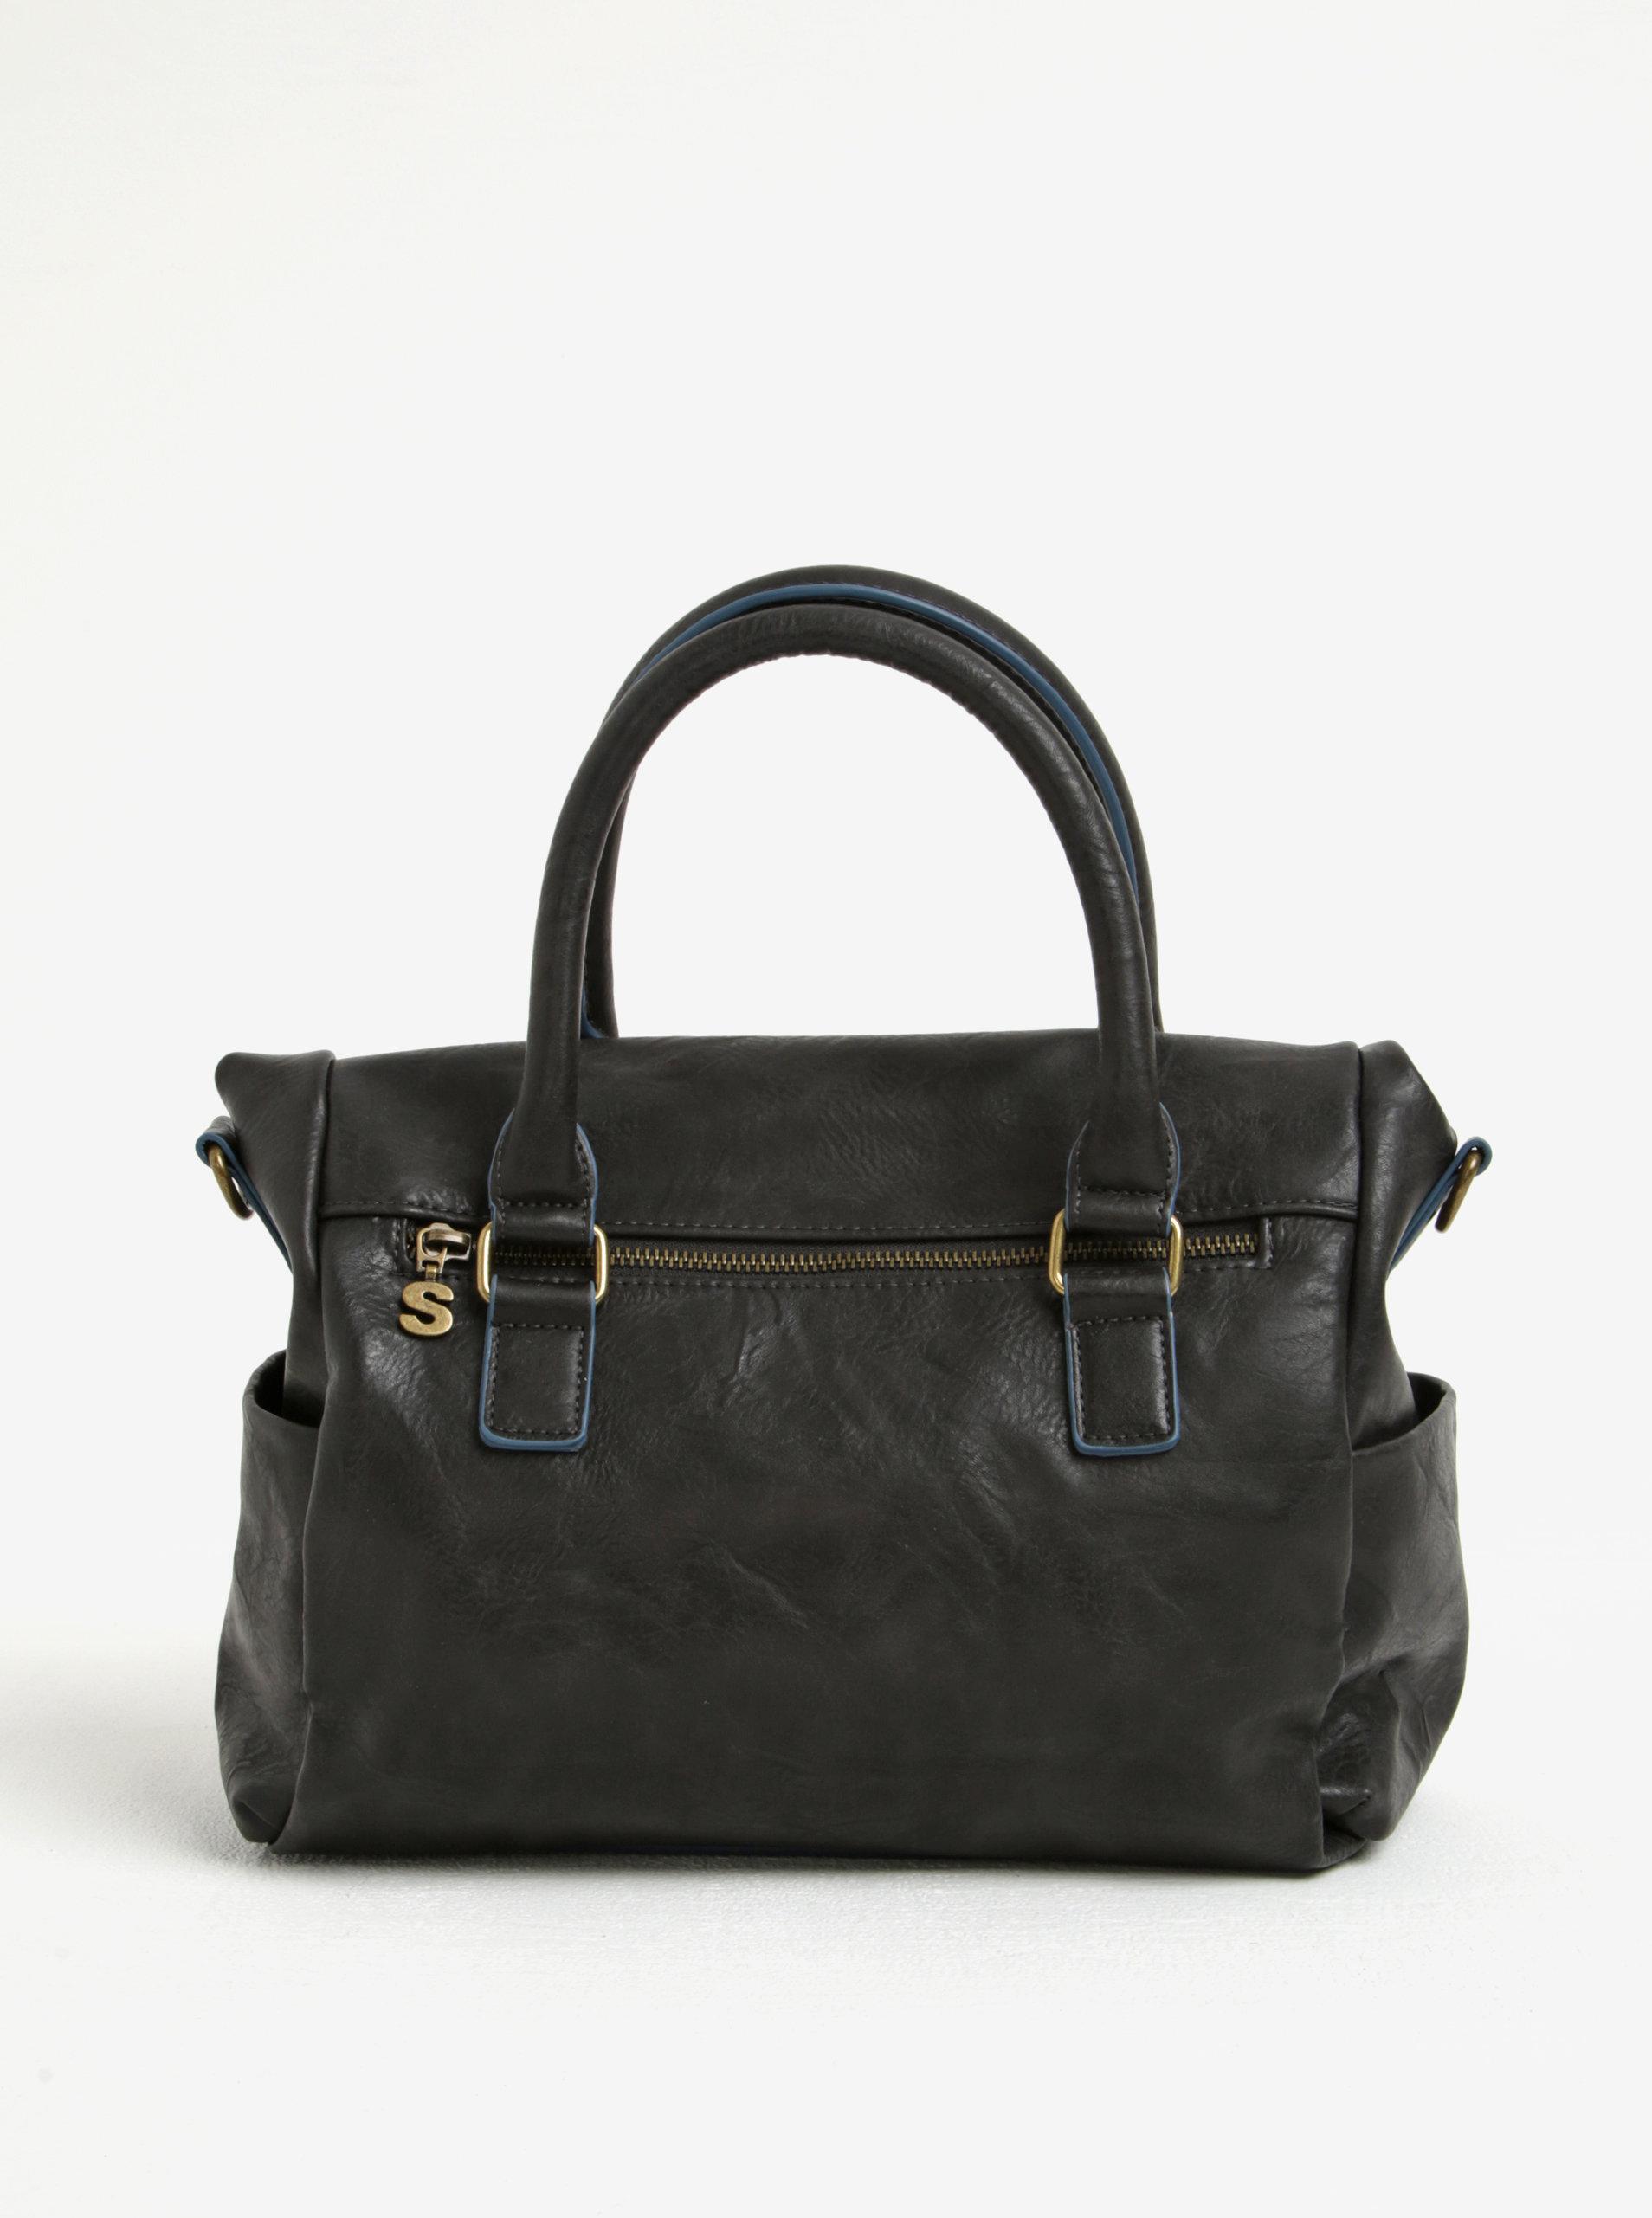 Čierna kabelka s ornamentmi Desigual Loverty Amber ... 97a3fed7885